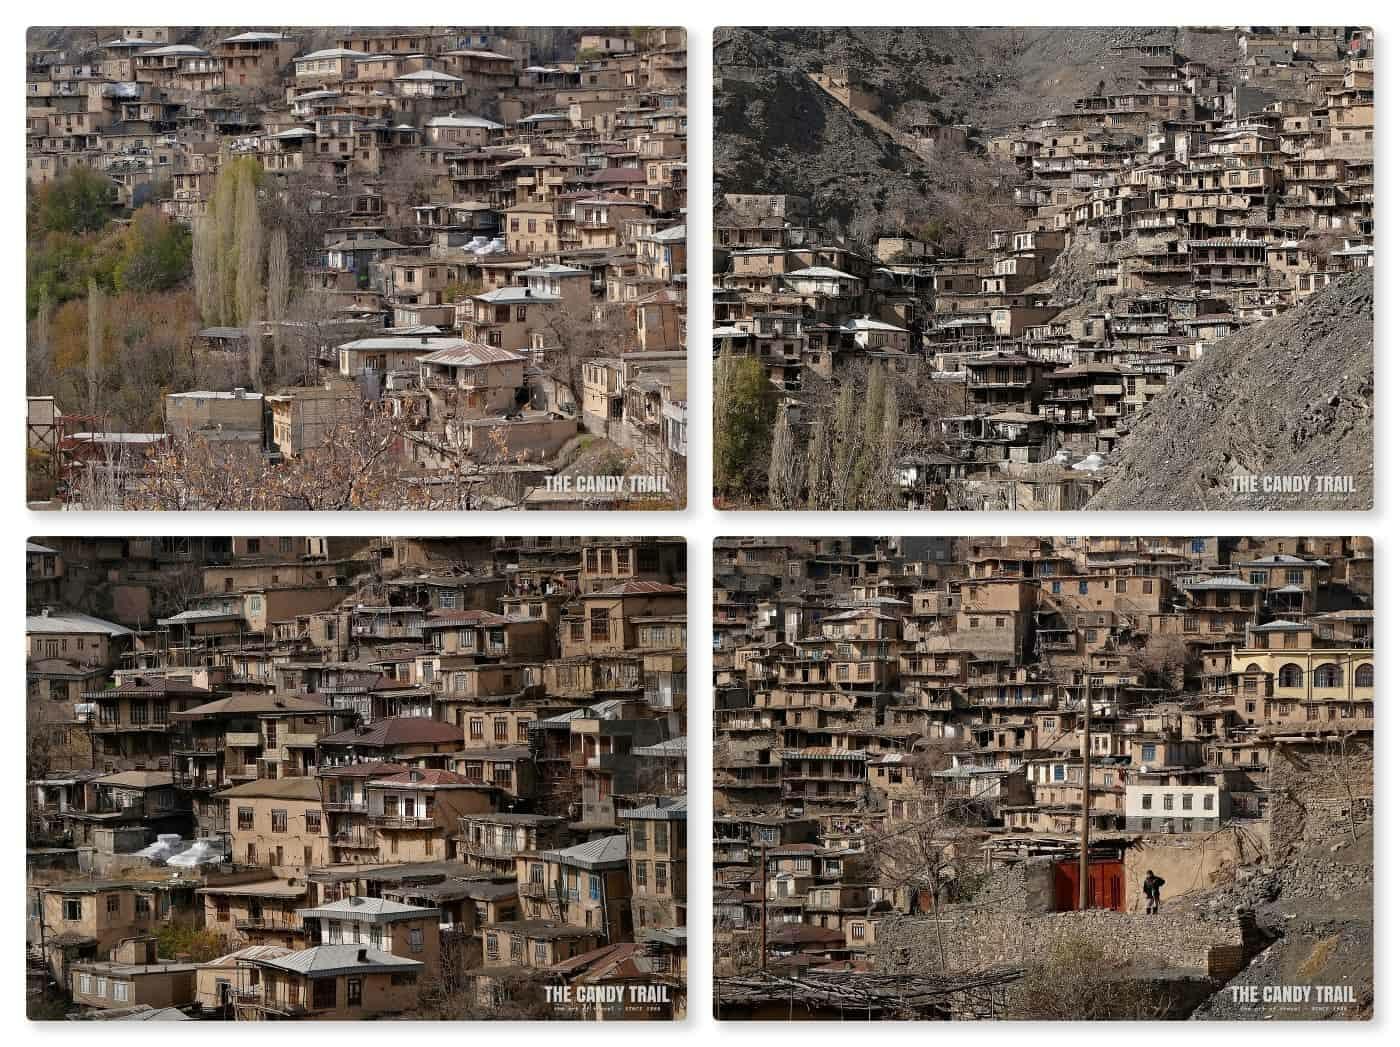 stepped houses of Kang village iran